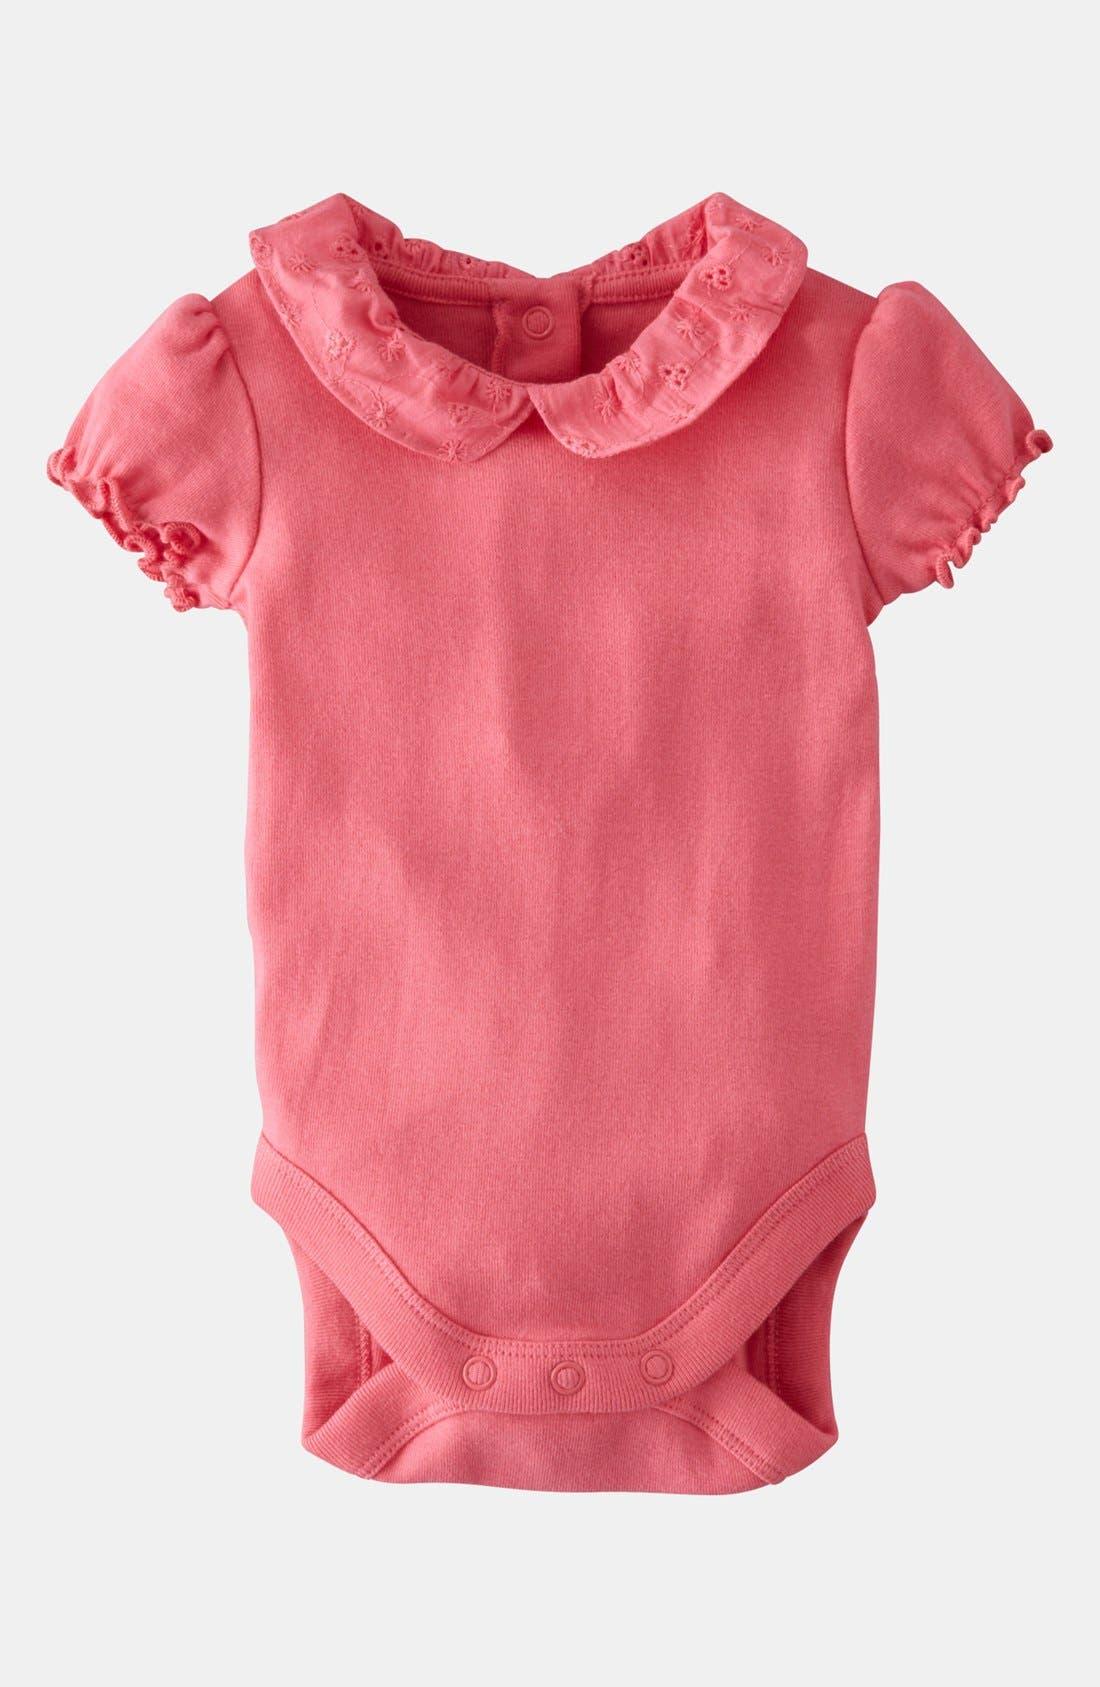 Alternate Image 1 Selected - Mini Boden 'Pretty Collared' Bodysuit (Baby)